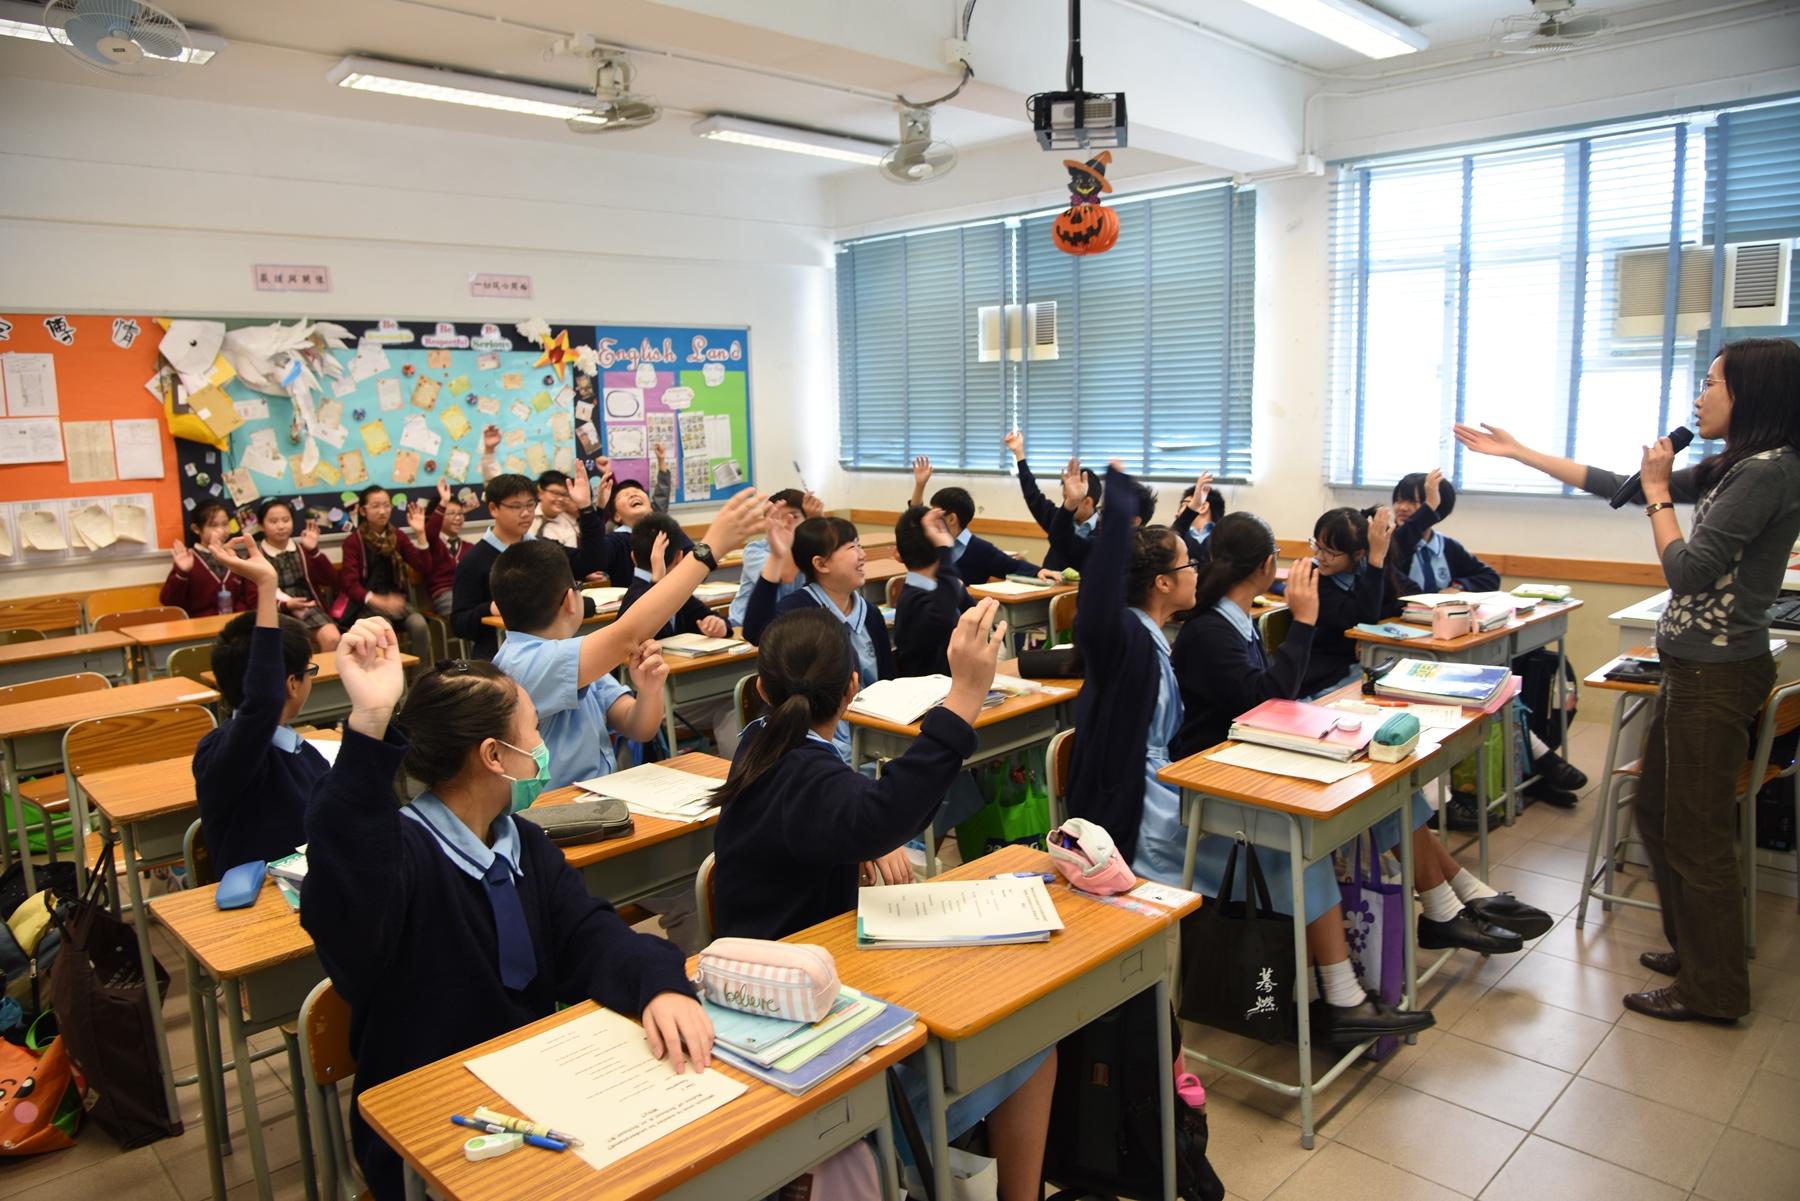 http://npc.edu.hk/sites/default/files/dsc_4976.jpg